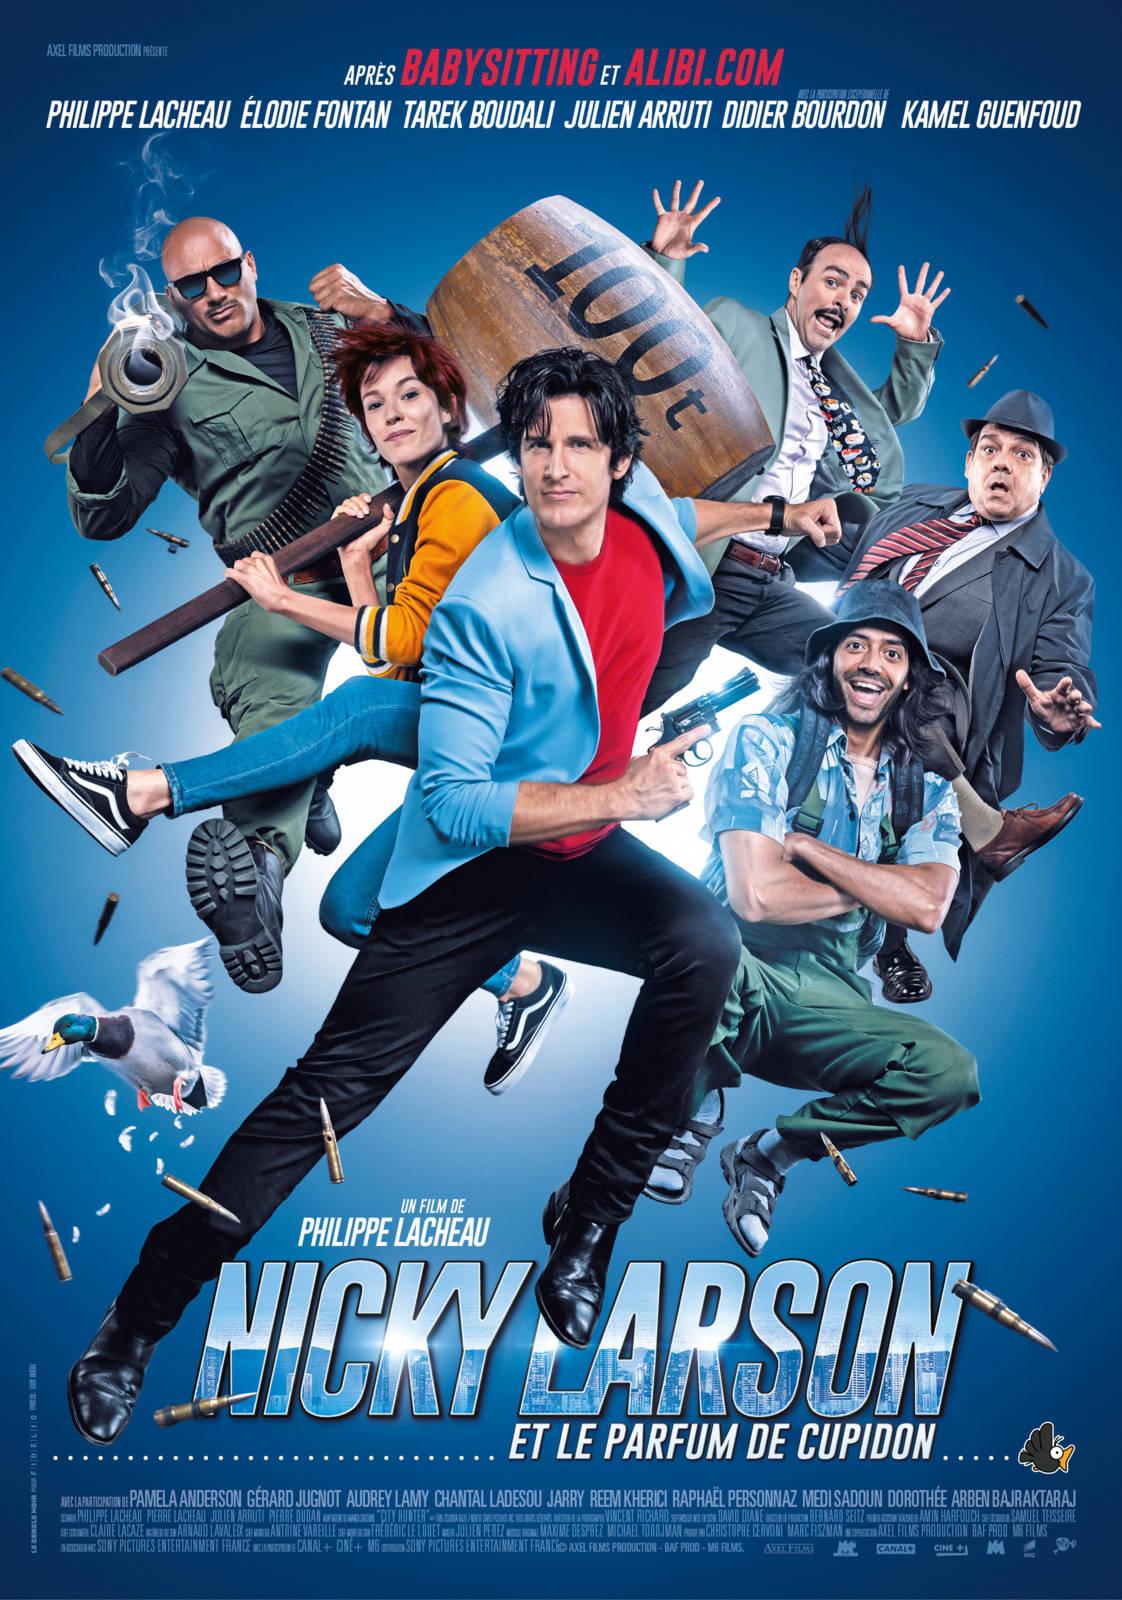 Movie Nicky Larson Et Le Parfum De Cupidon Cineman